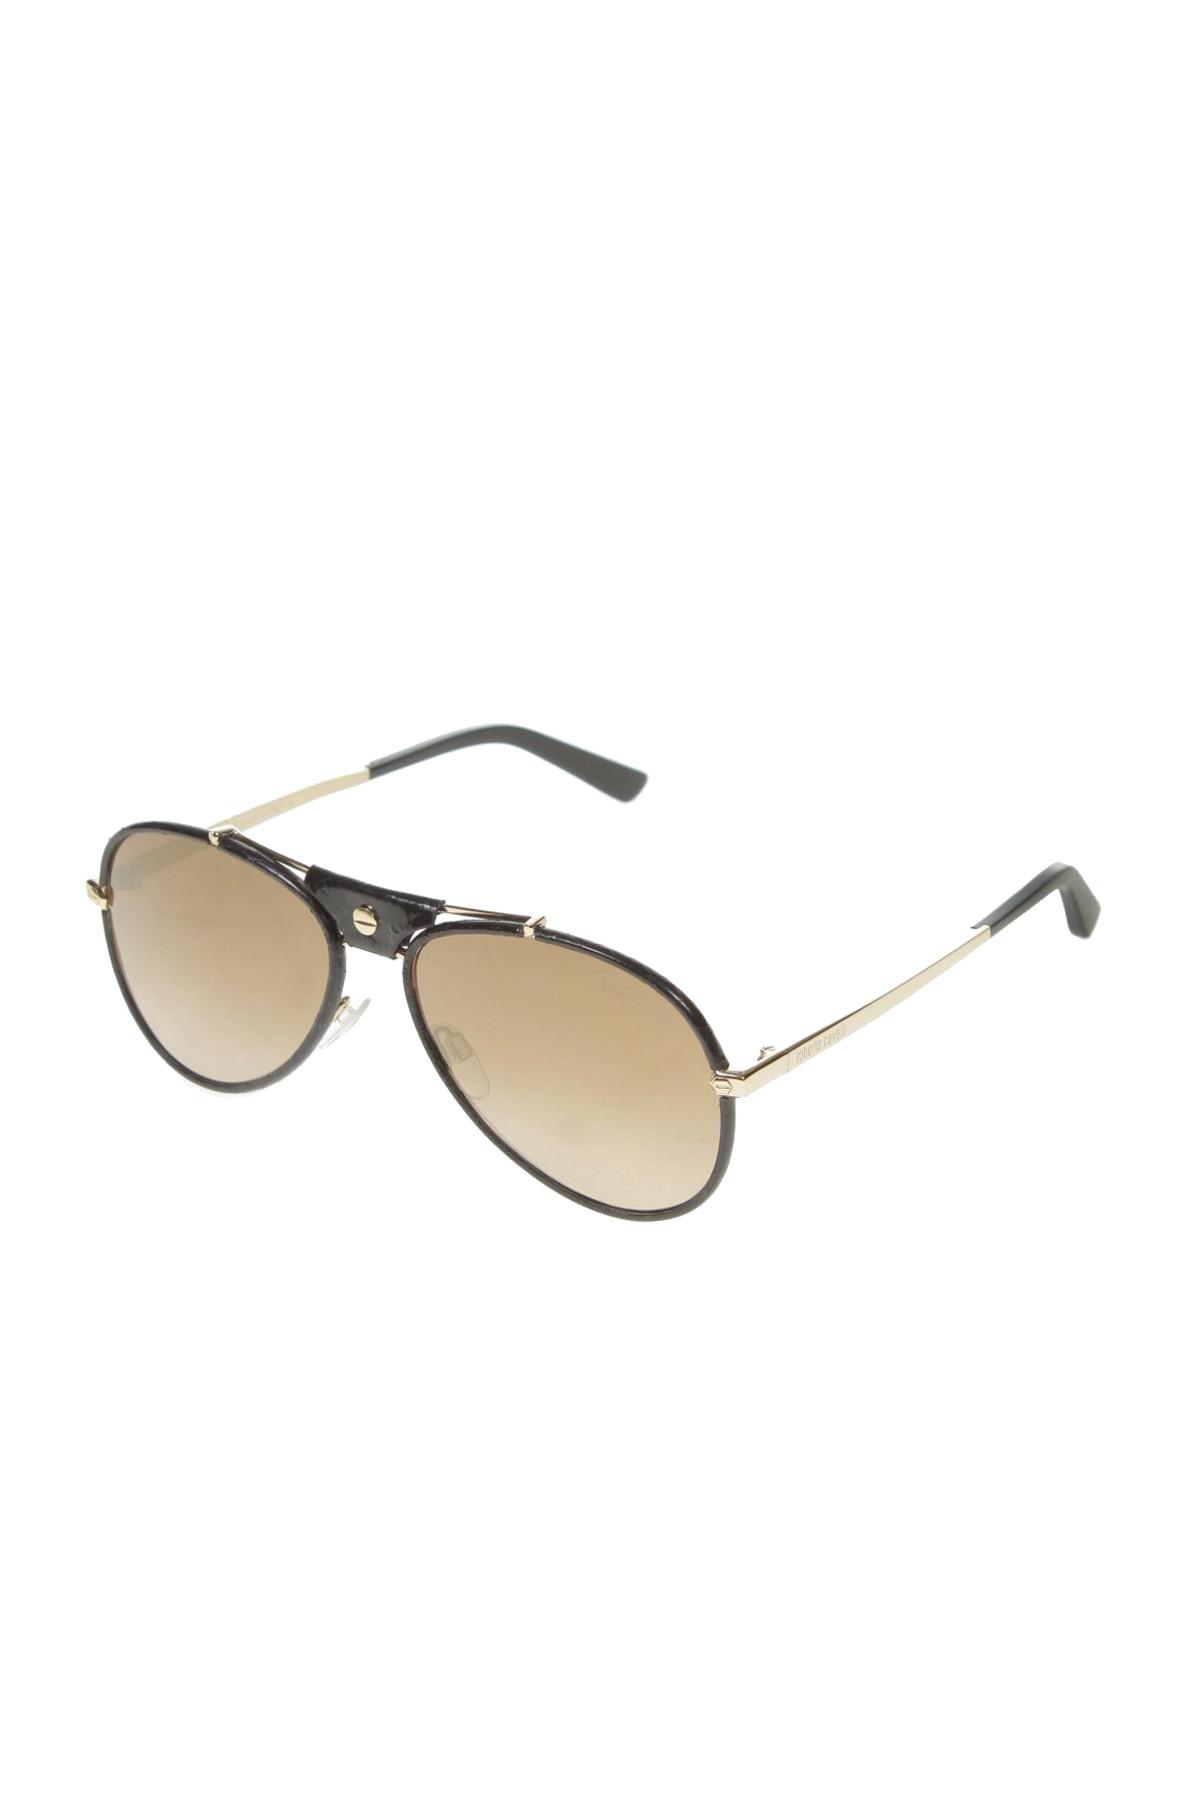 Slnečné okuliare Roberto Cavalli - za výhodnú cenu na Remix -  103056544 01014b6ee5d